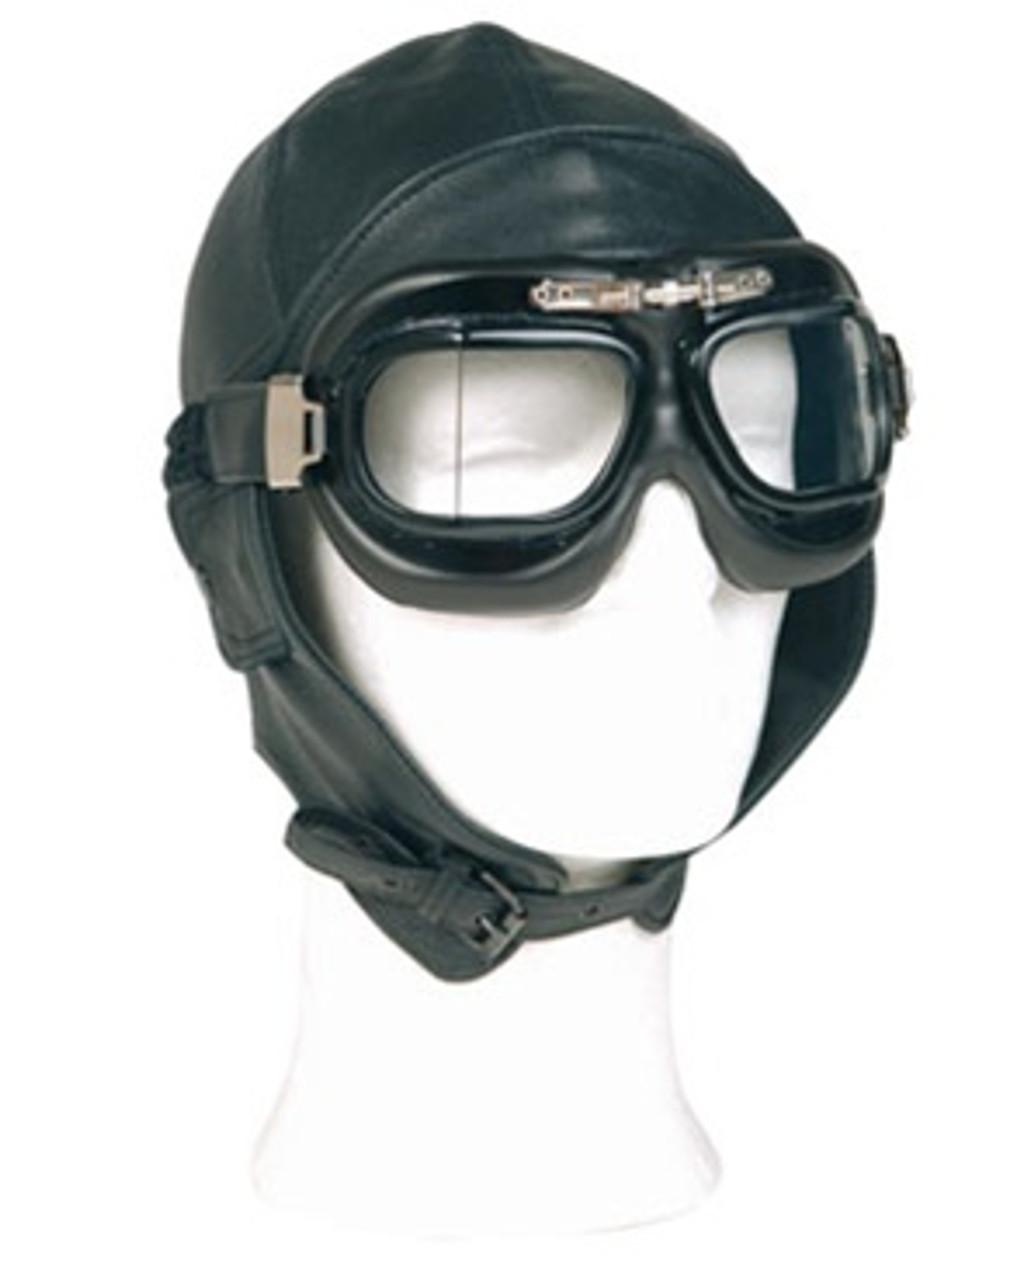 Repro German Leather Aviator Helmet from Hessen Surplus